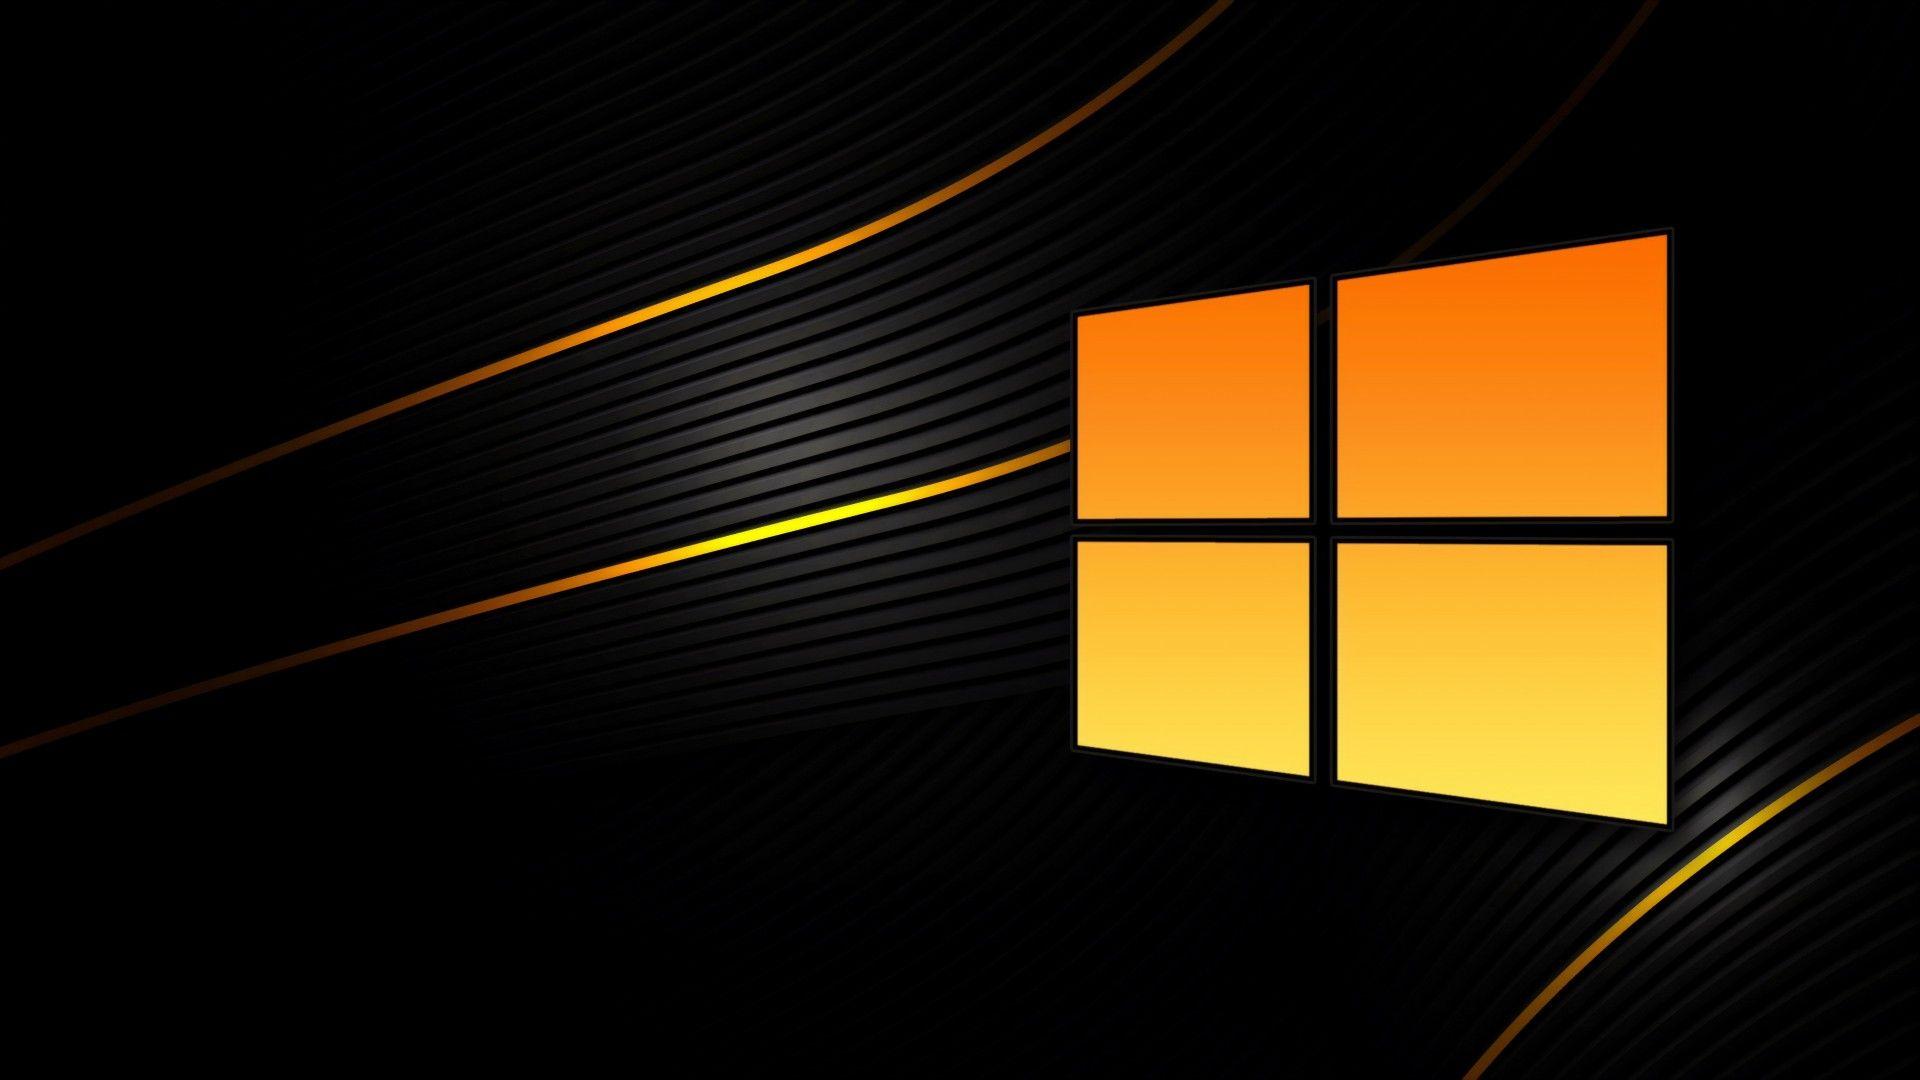 Black Windows 10 Lock Screen Wallpaper